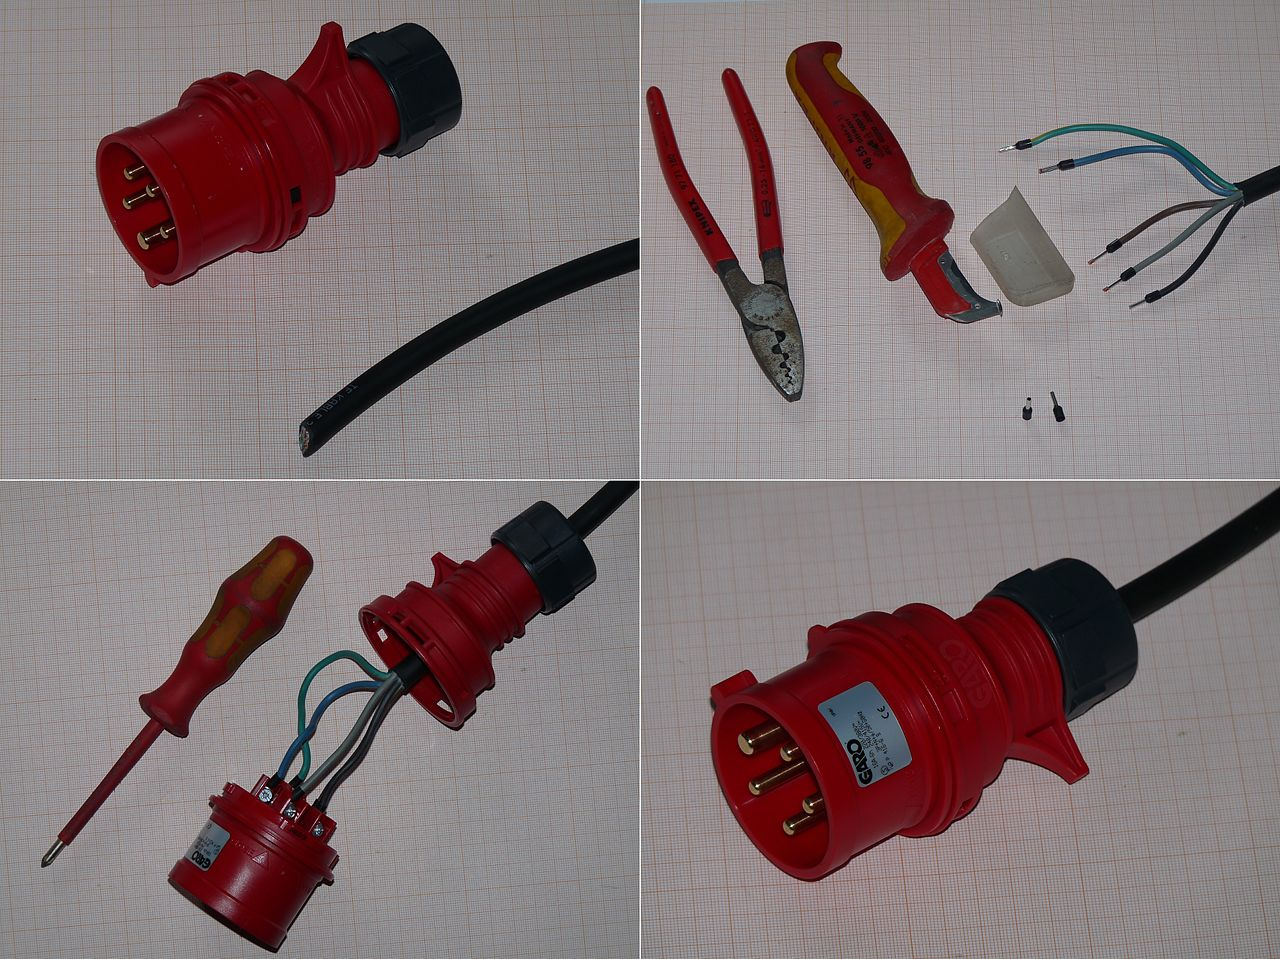 hight resolution of three phase plug wiring wiring diagram dat wiring 3 phase plug australia three phase plug wiring